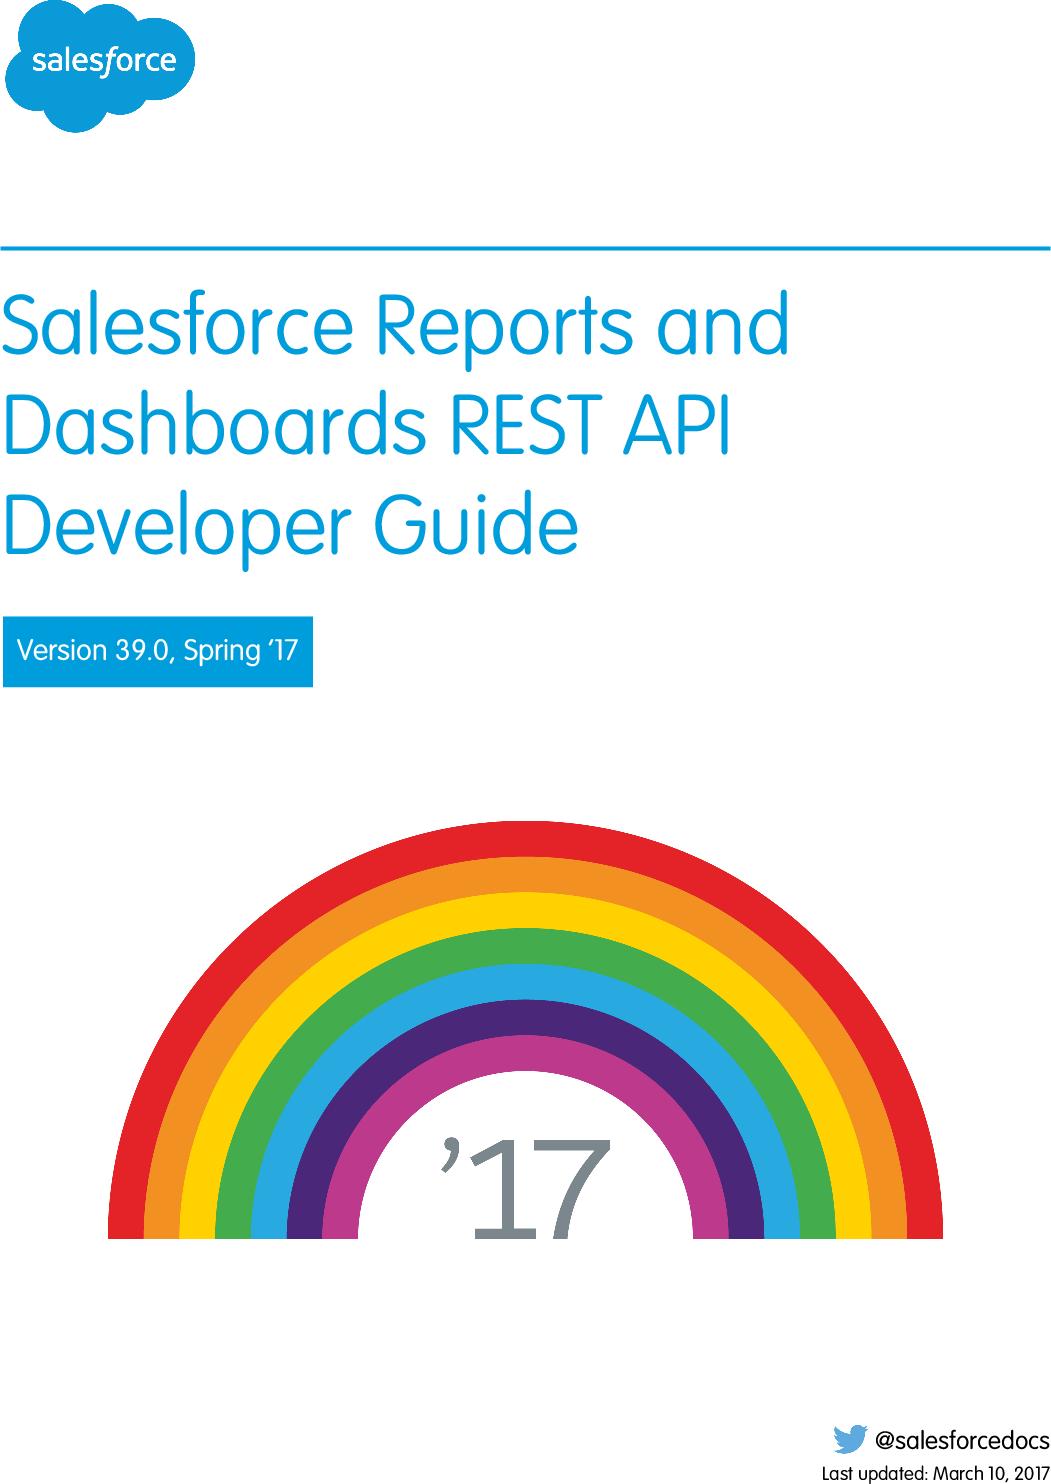 Salesforce Reports And Dashboards REST API Developer